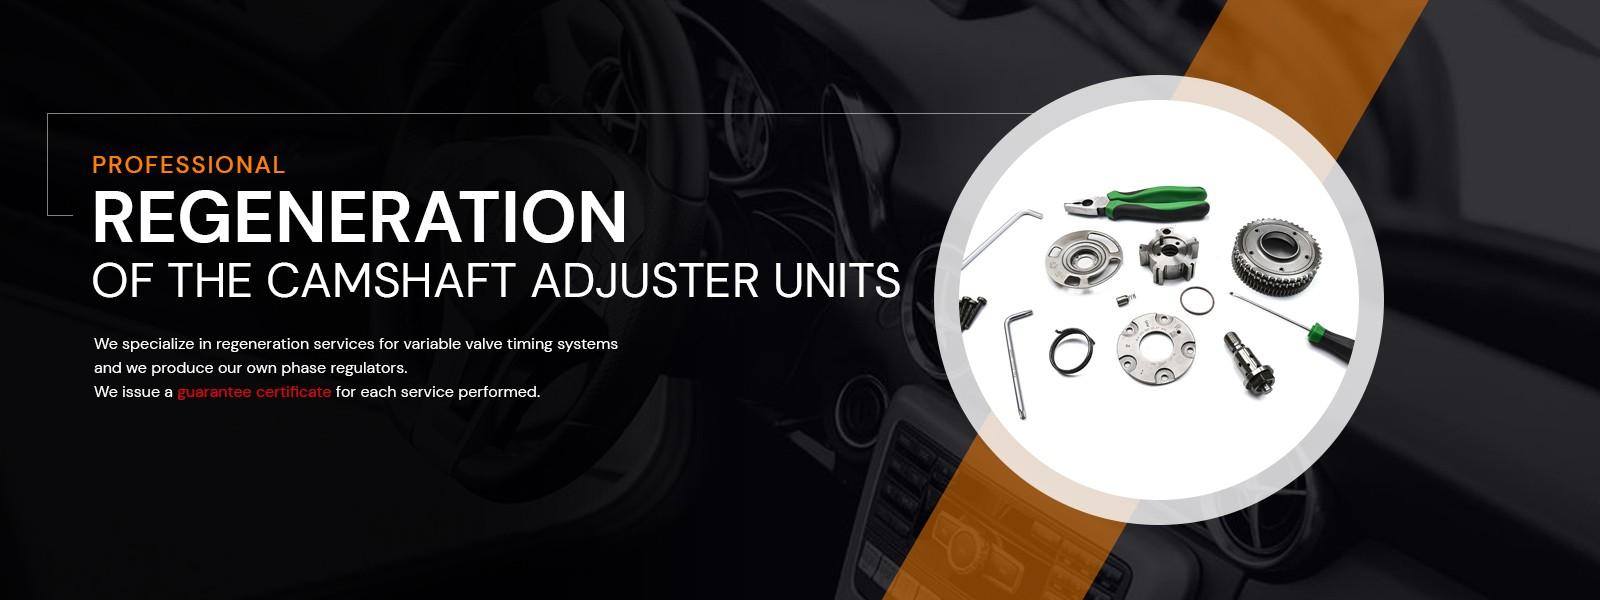 Professionall regeneration of the camshaft adjuster units